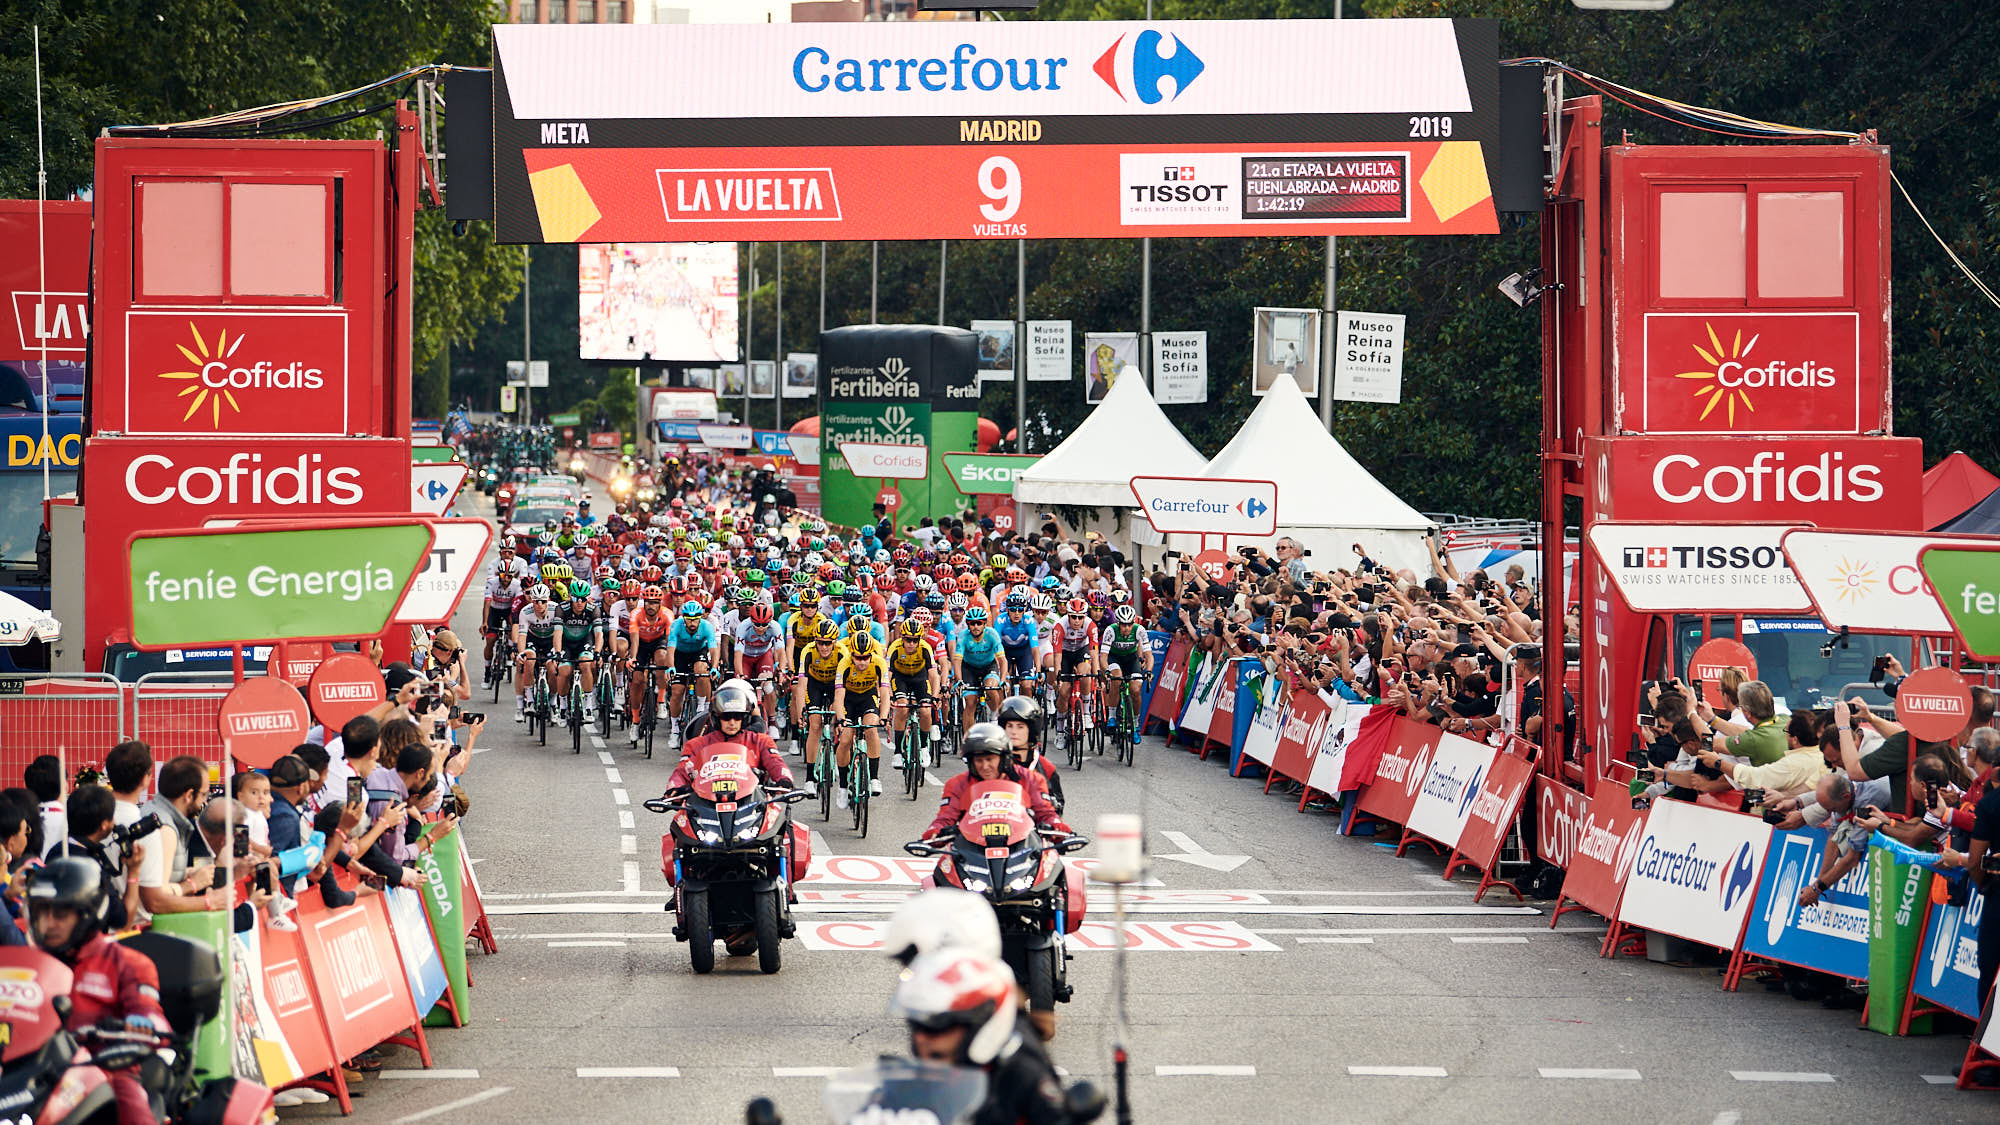 La Vuelta peloton crosses the line during La Vuelta final in Madrid